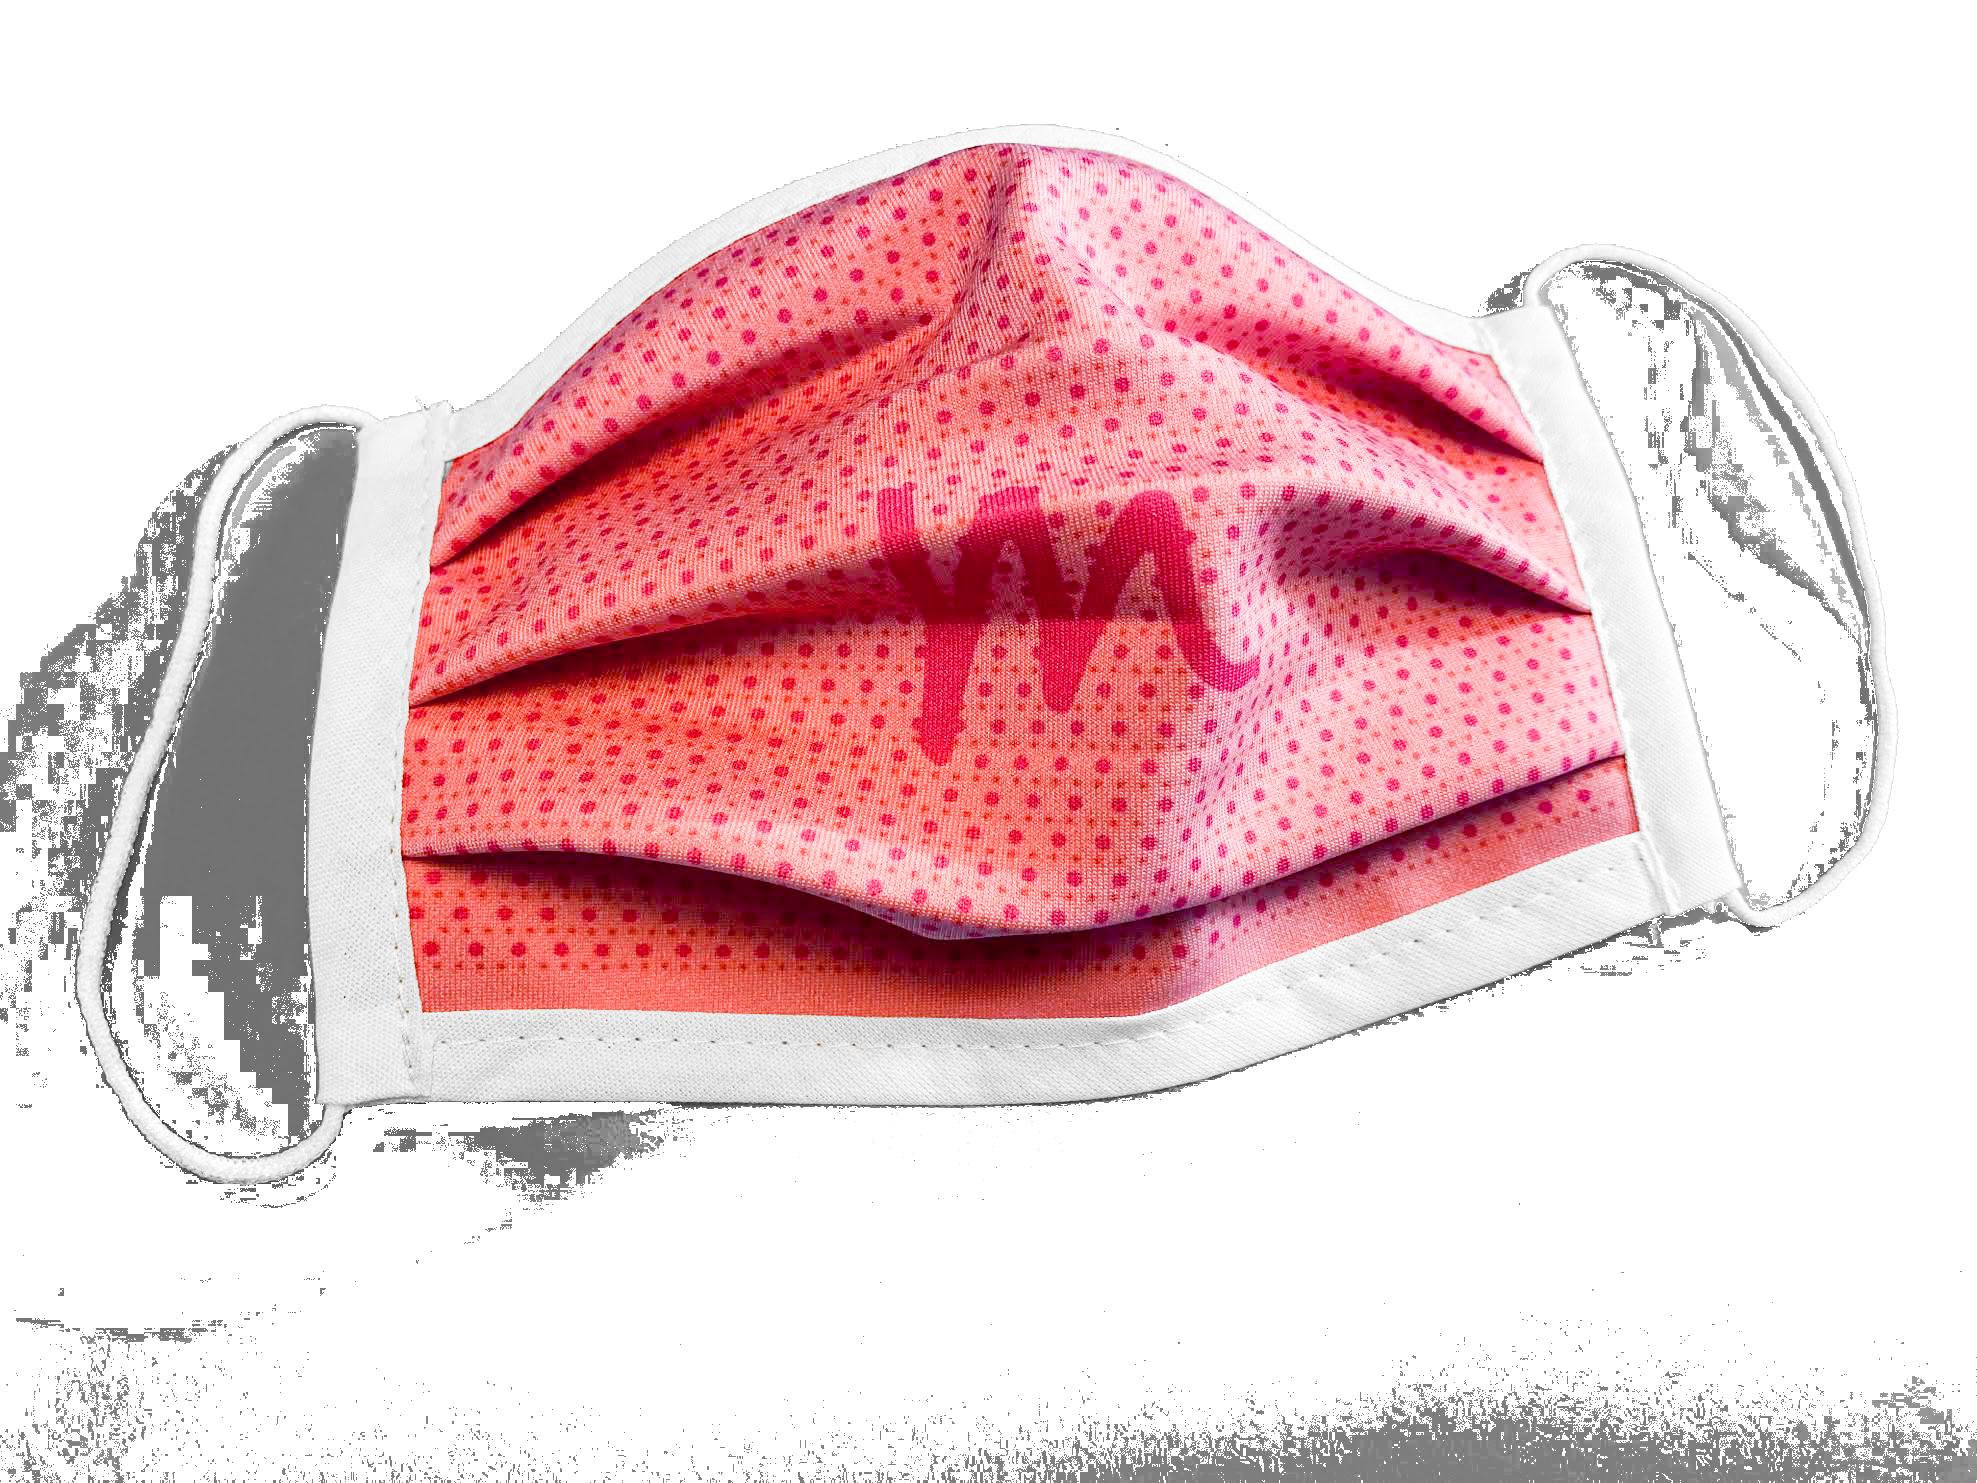 Miss Moneypenny Hygienemaske 00015